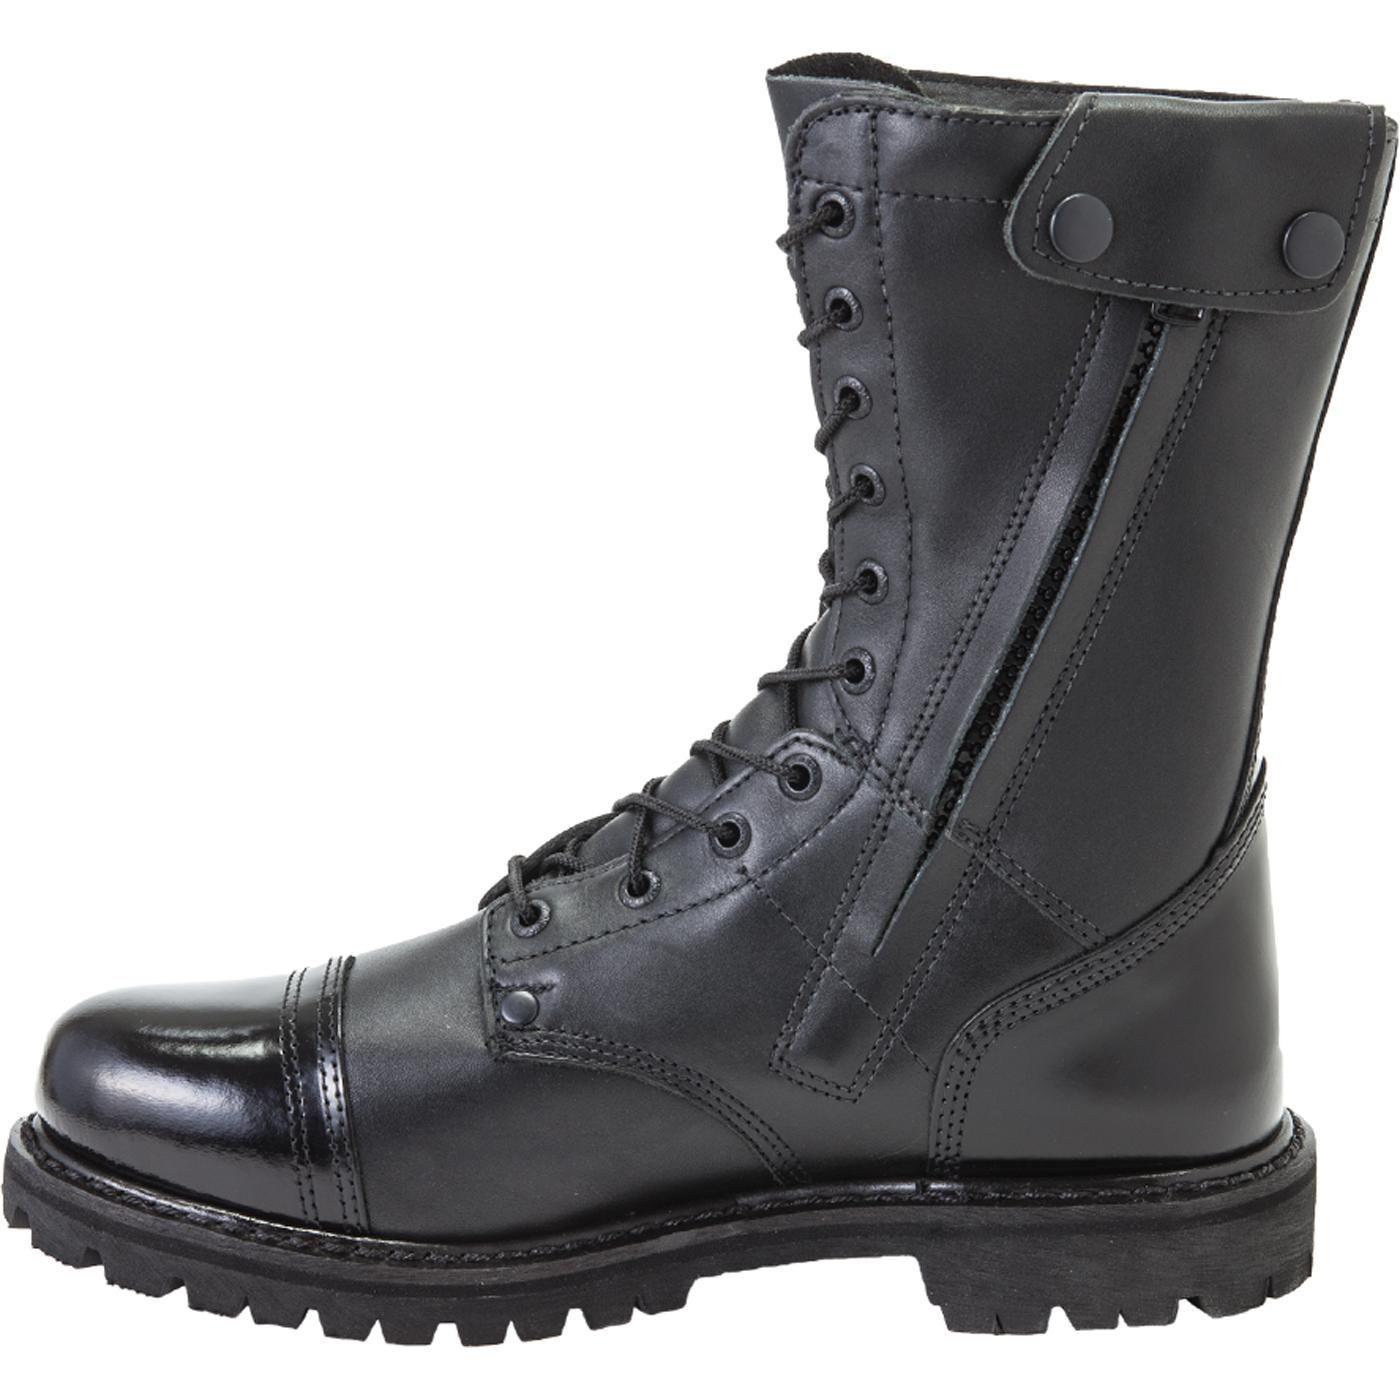 Rocky Women's Side Zipper Jump Boot | Work boots | Duty ... - photo #38